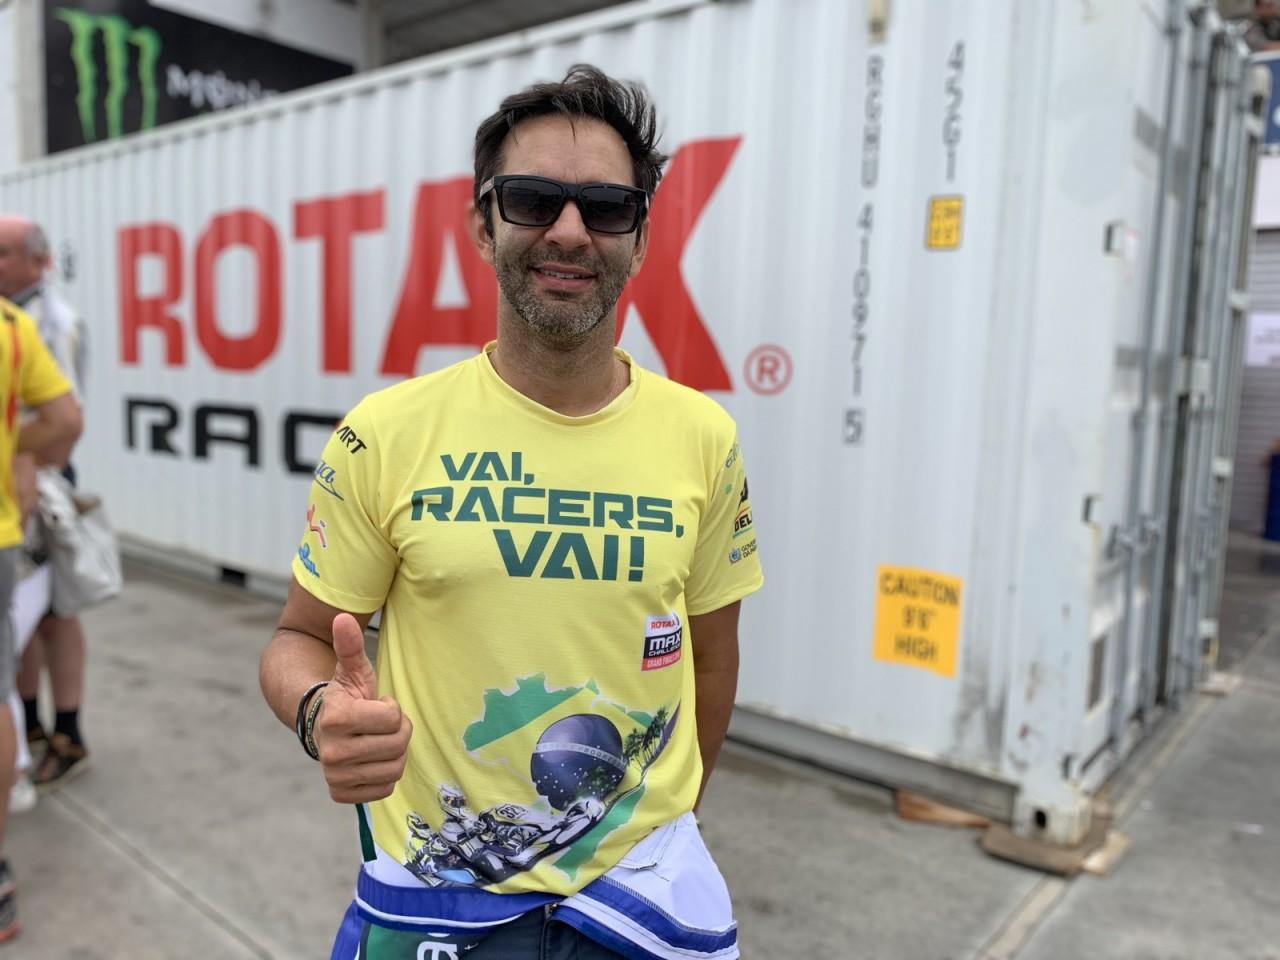 img 0452 - Ex-Fórmula 1, Antônio Pizzonia vai disputar Mundial de Kart